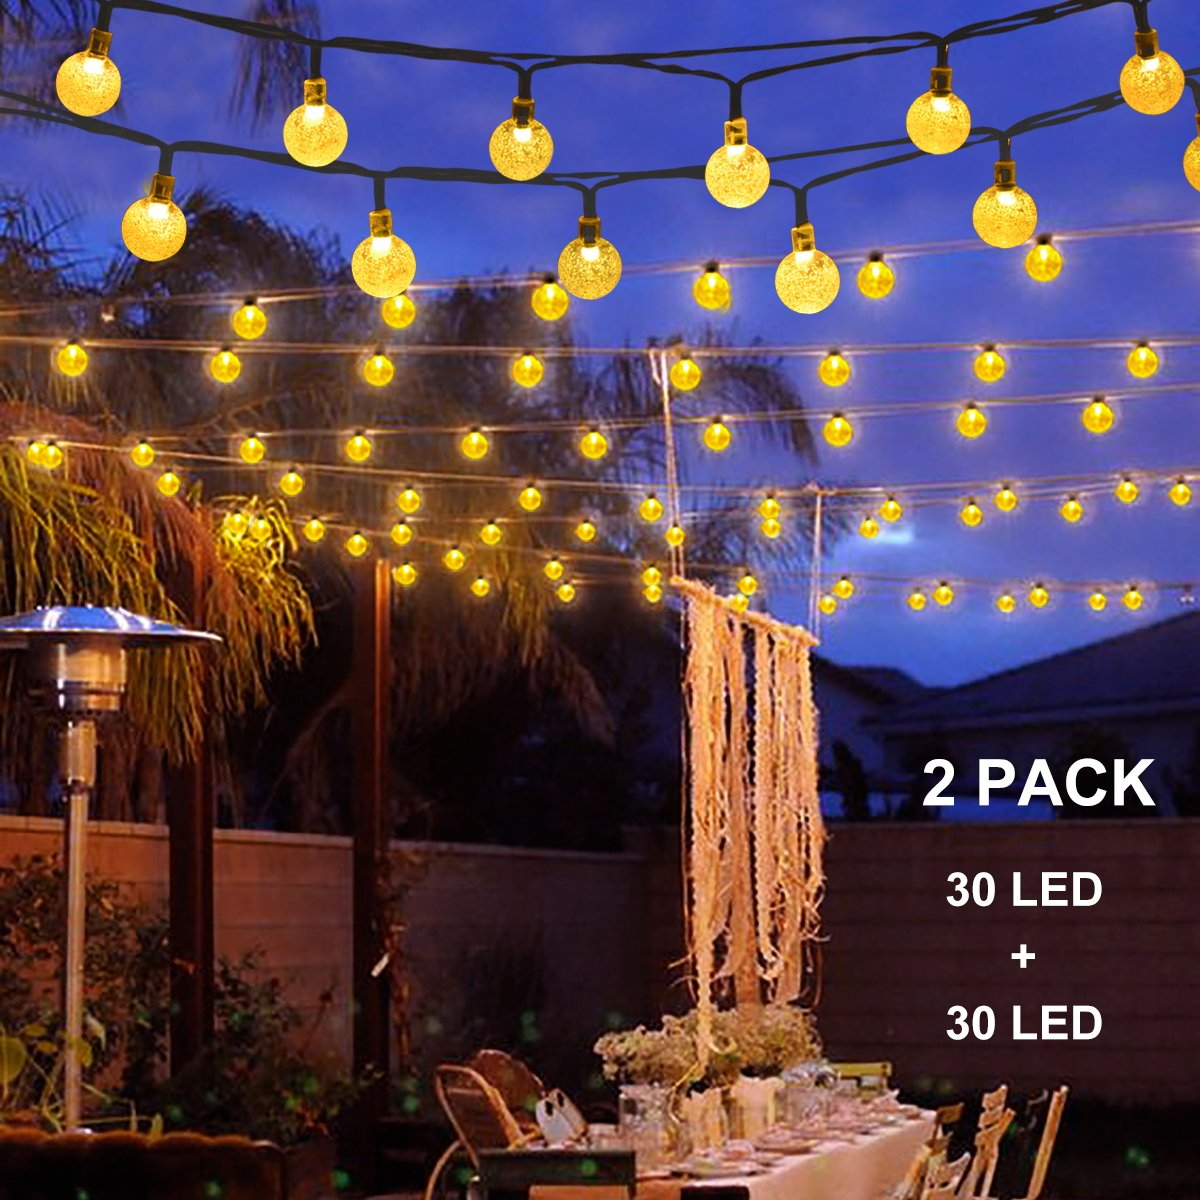 Outdoor Lighting Ideas Solar: Binval Solar String Lights For Outdoor Patio Lawn